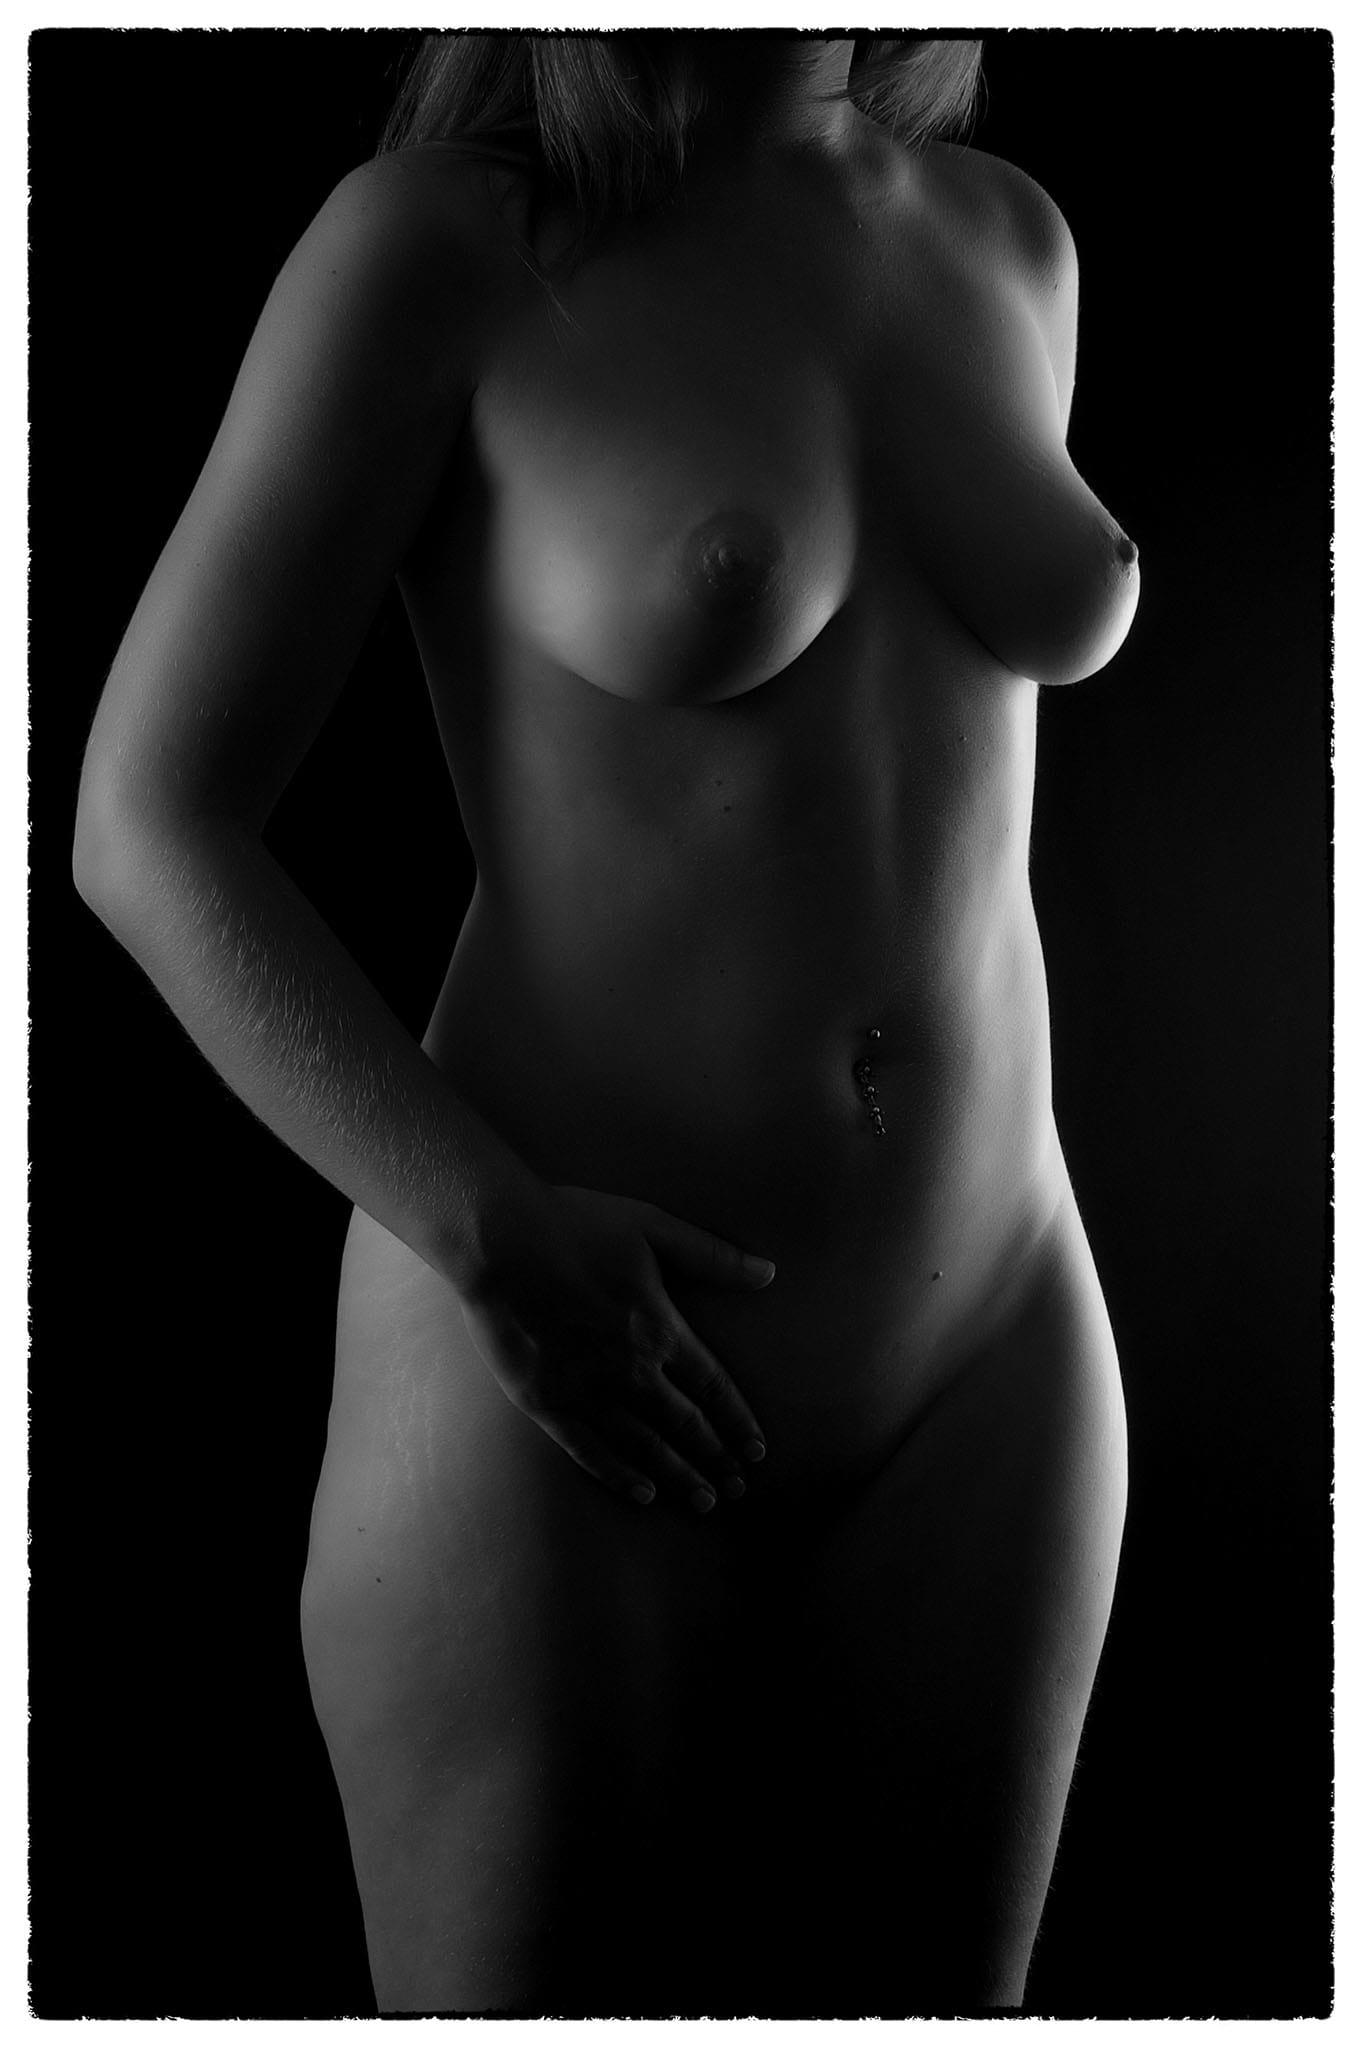 Akt 18 - Akt Nude Act Aktfotografie Erotik Erotic